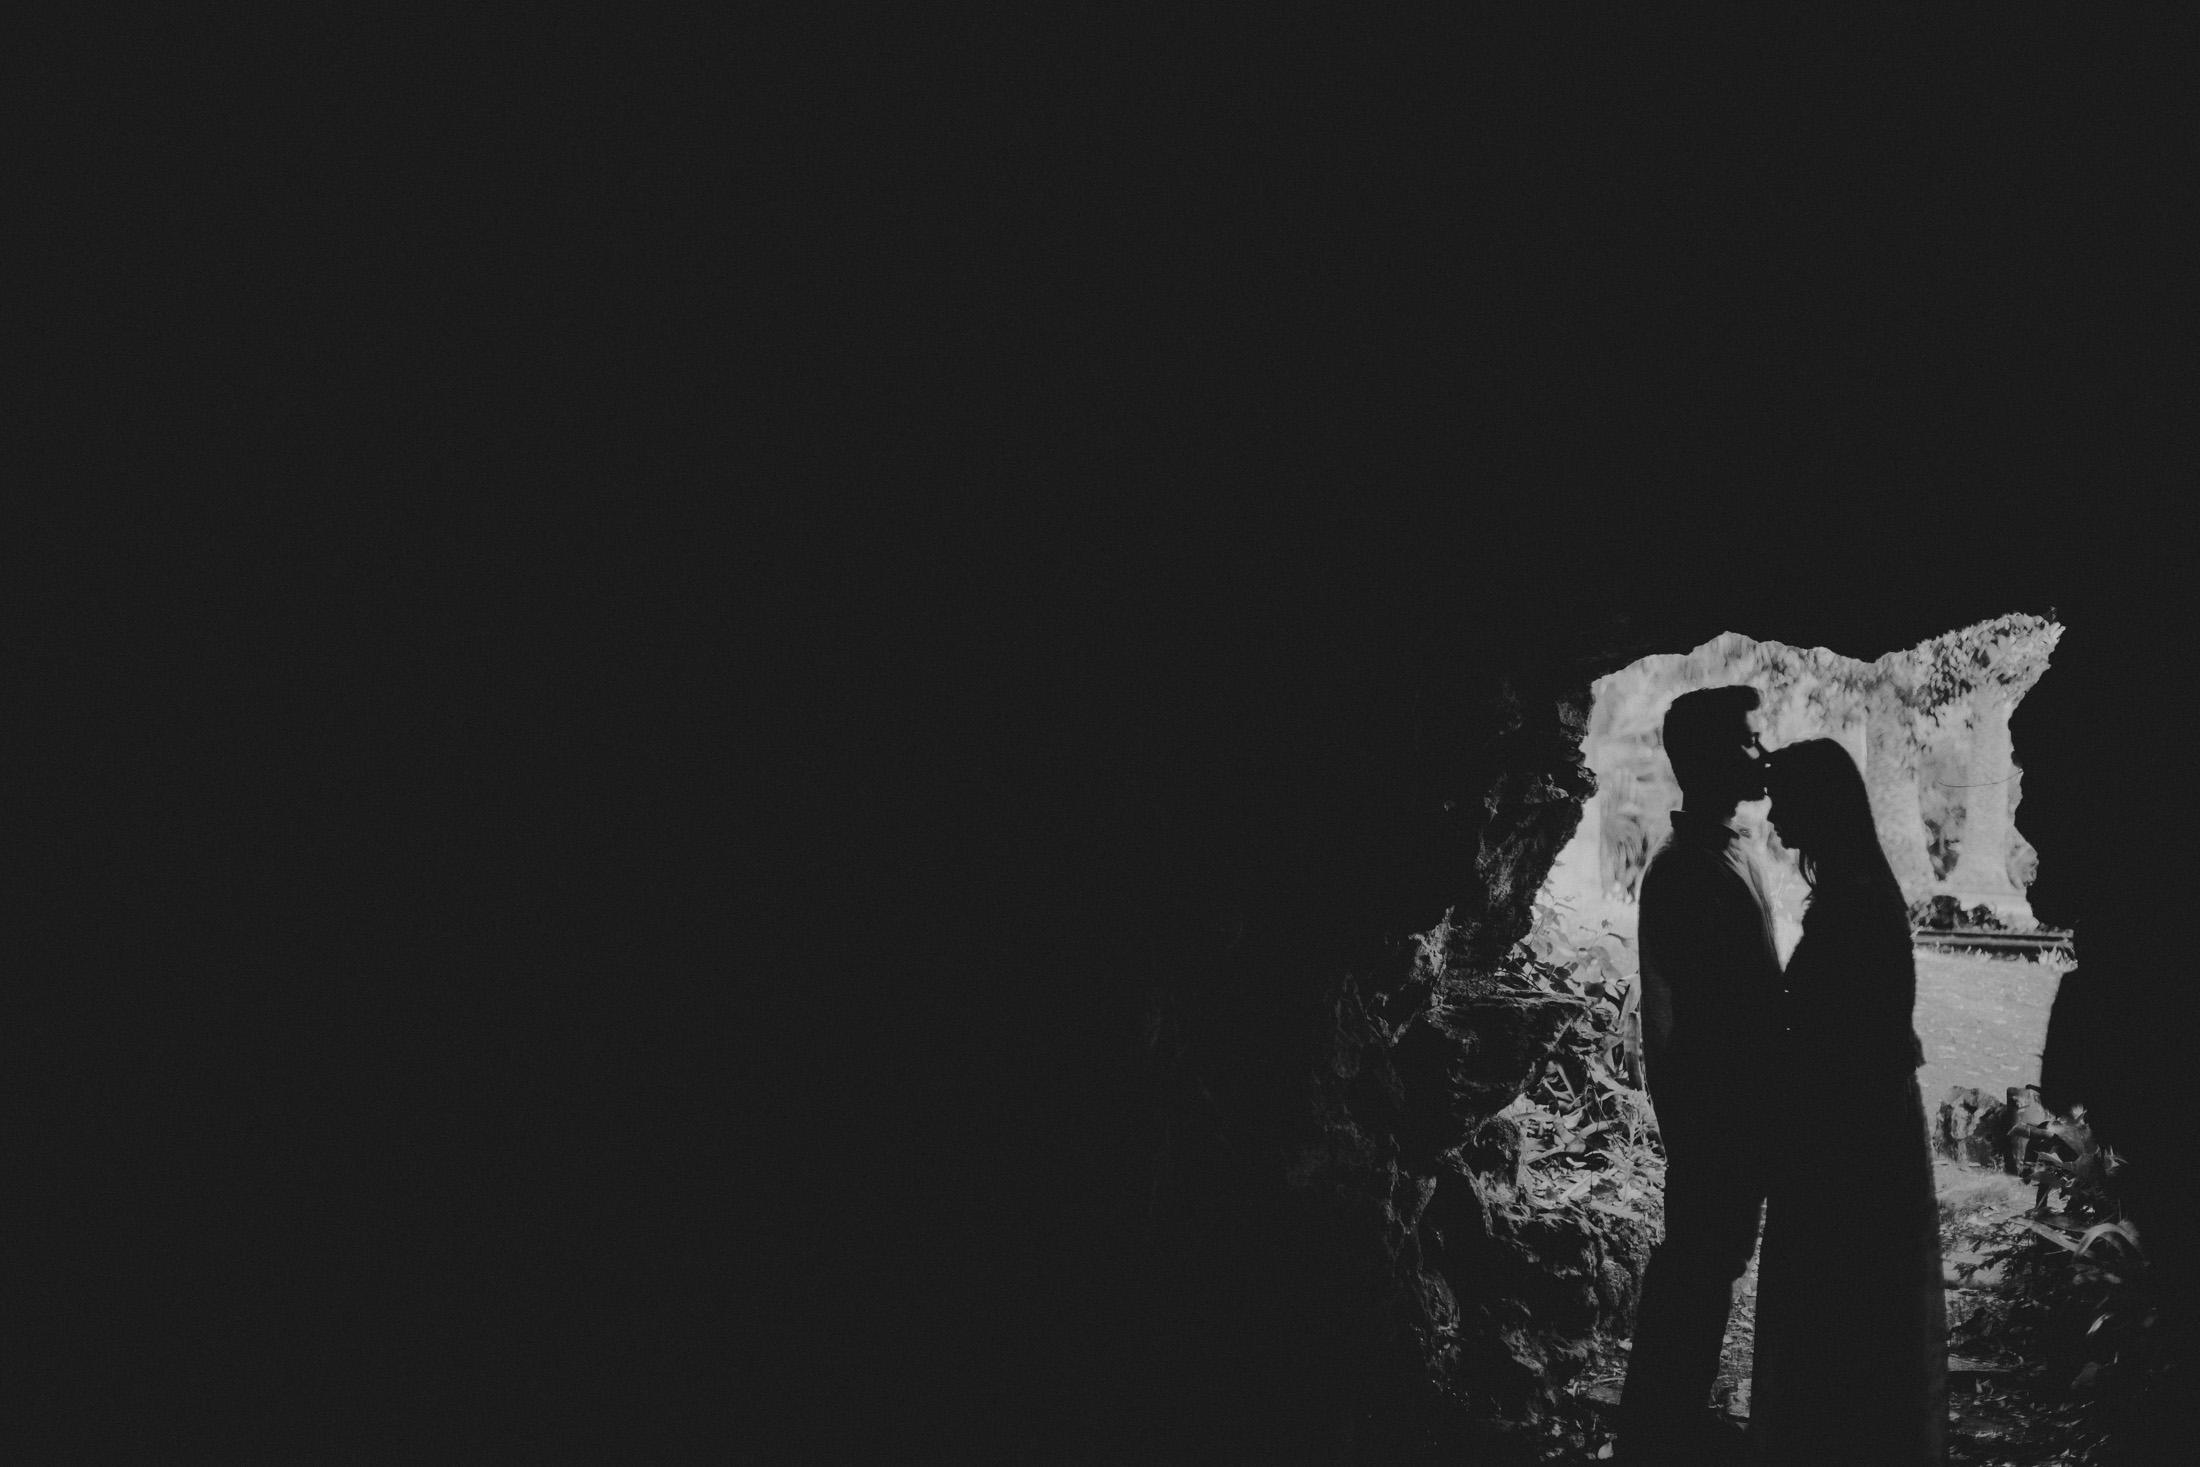 15 engagement-love-session-fundacao-Champalimaud-Filipe-Santiago-Fotografia-Lisboa-Mafra-Malveira-Fotografo